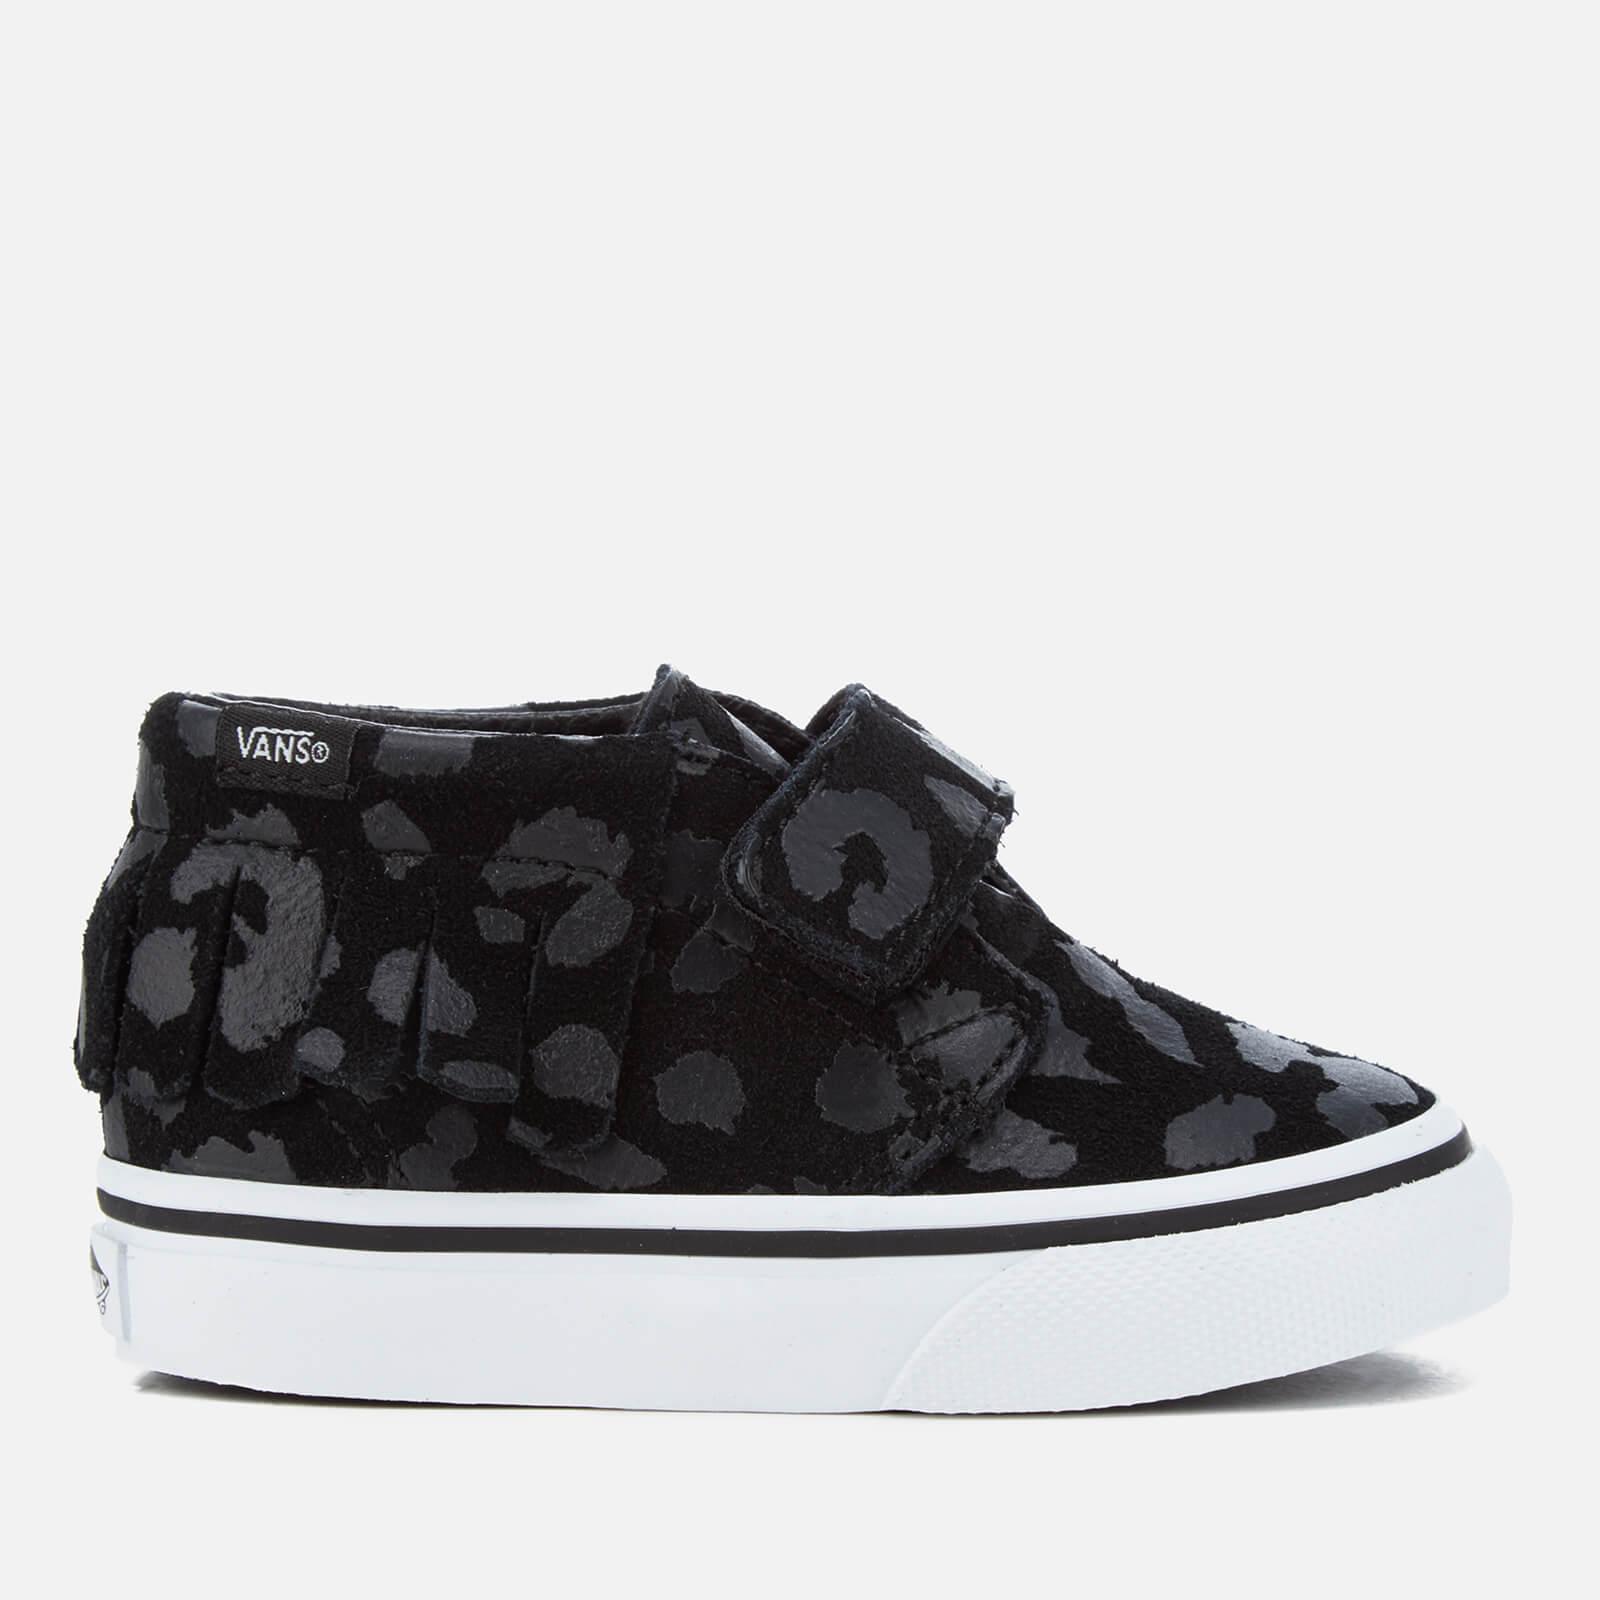 8171957128 Vans Toddlers' Chukka V Moc Leopard Suede Trainers - Black